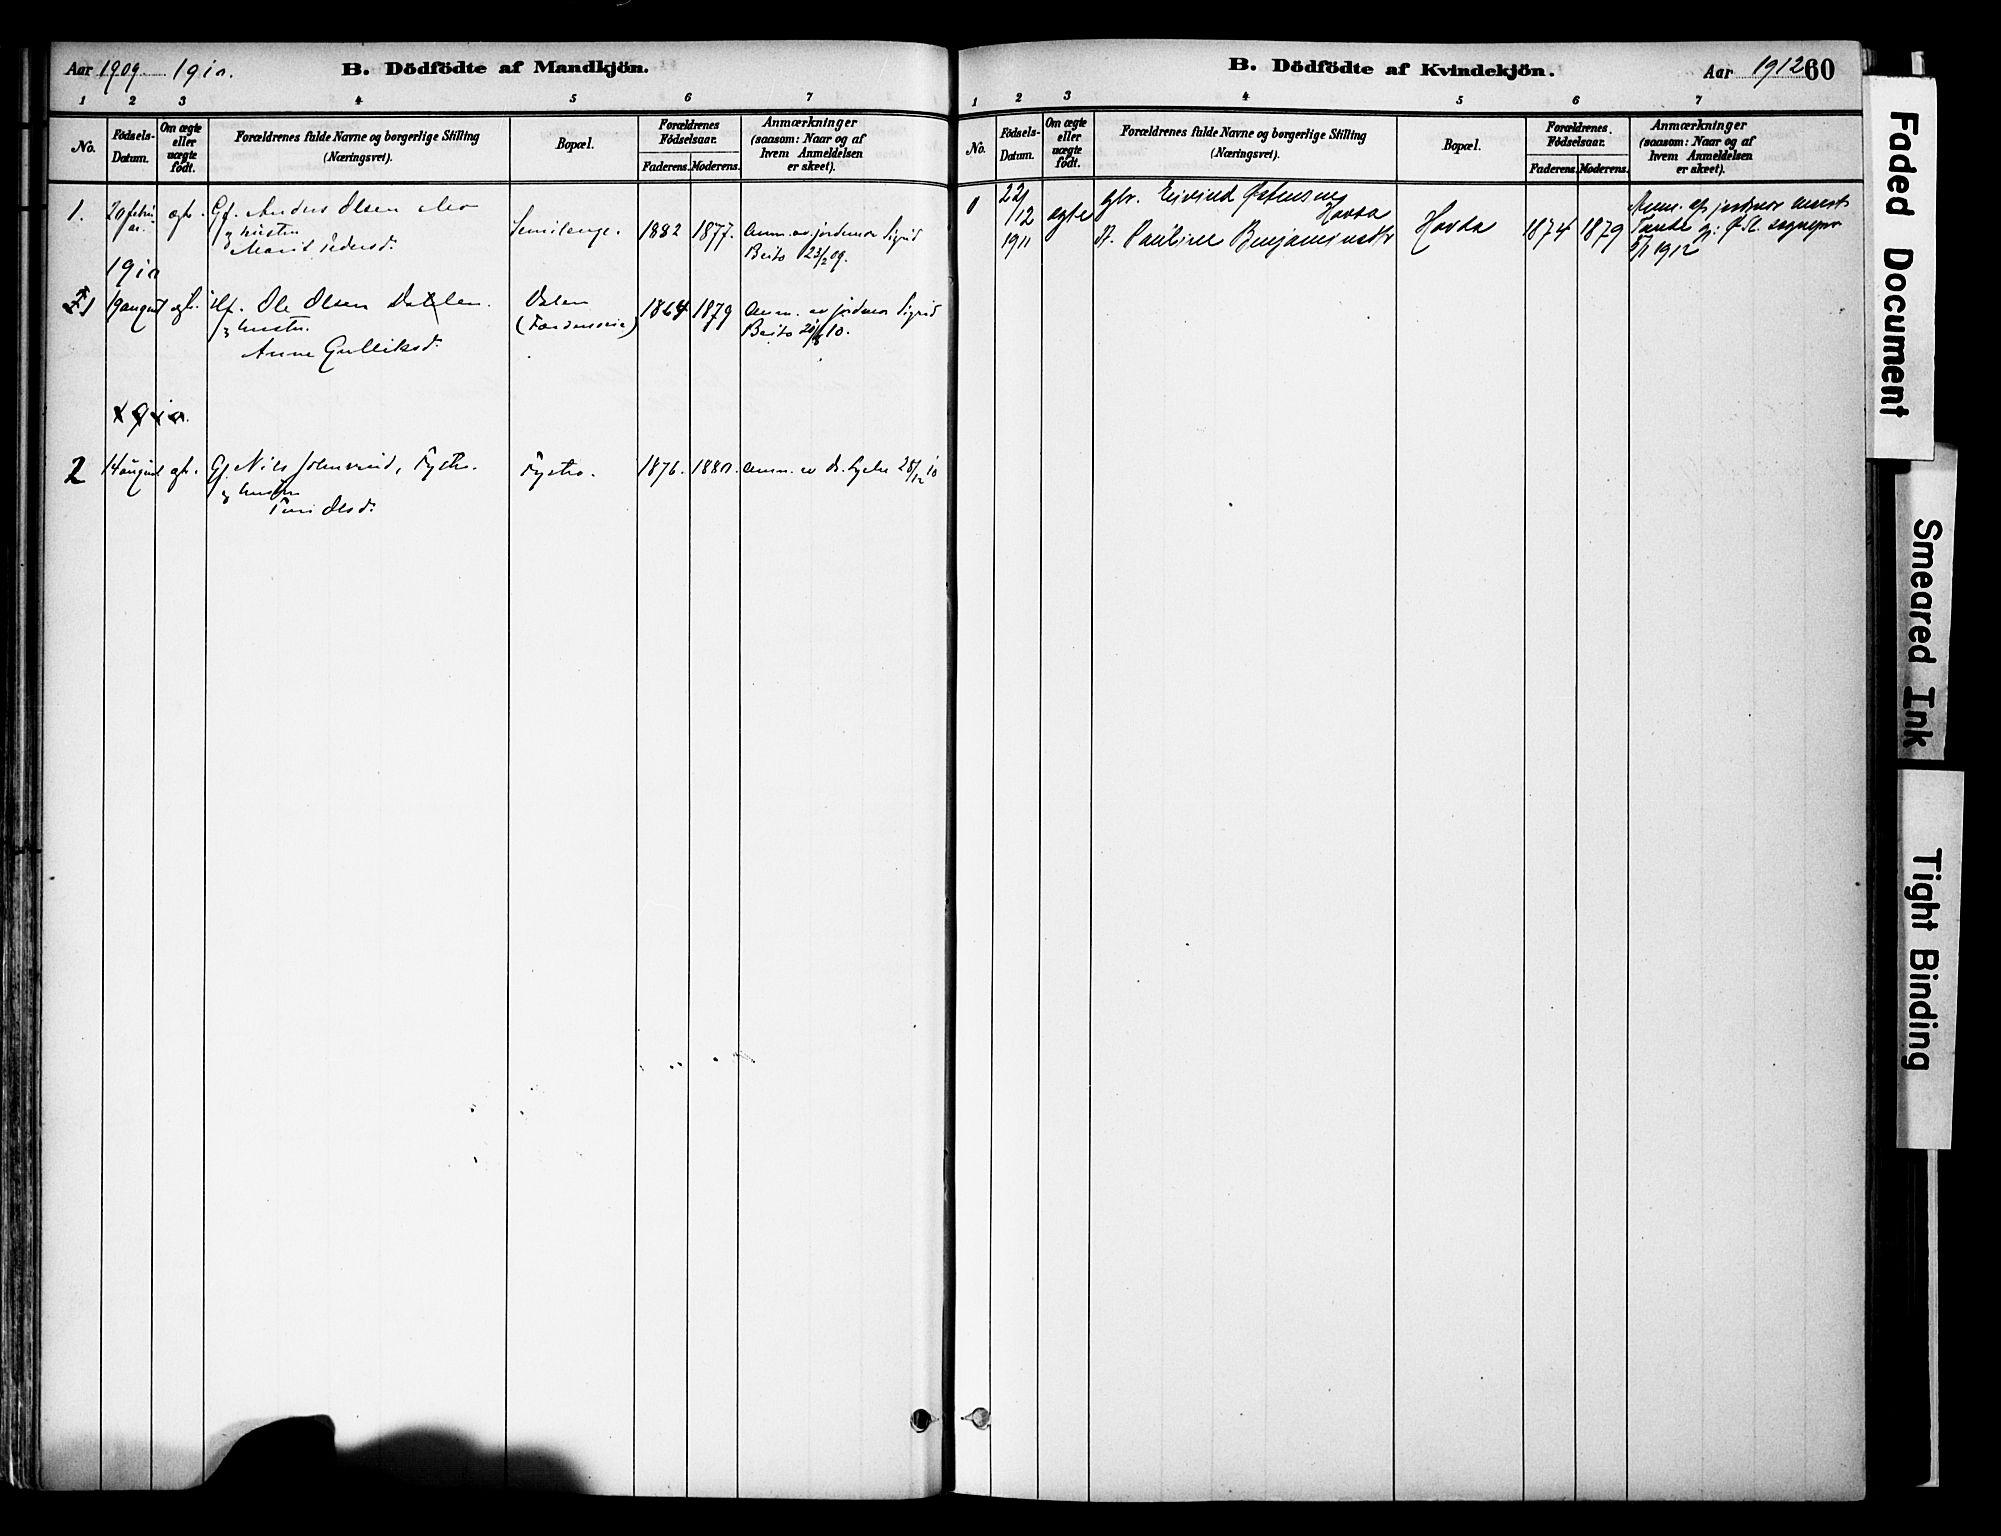 SAH, Vestre Slidre prestekontor, Ministerialbok nr. 6, 1881-1912, s. 60